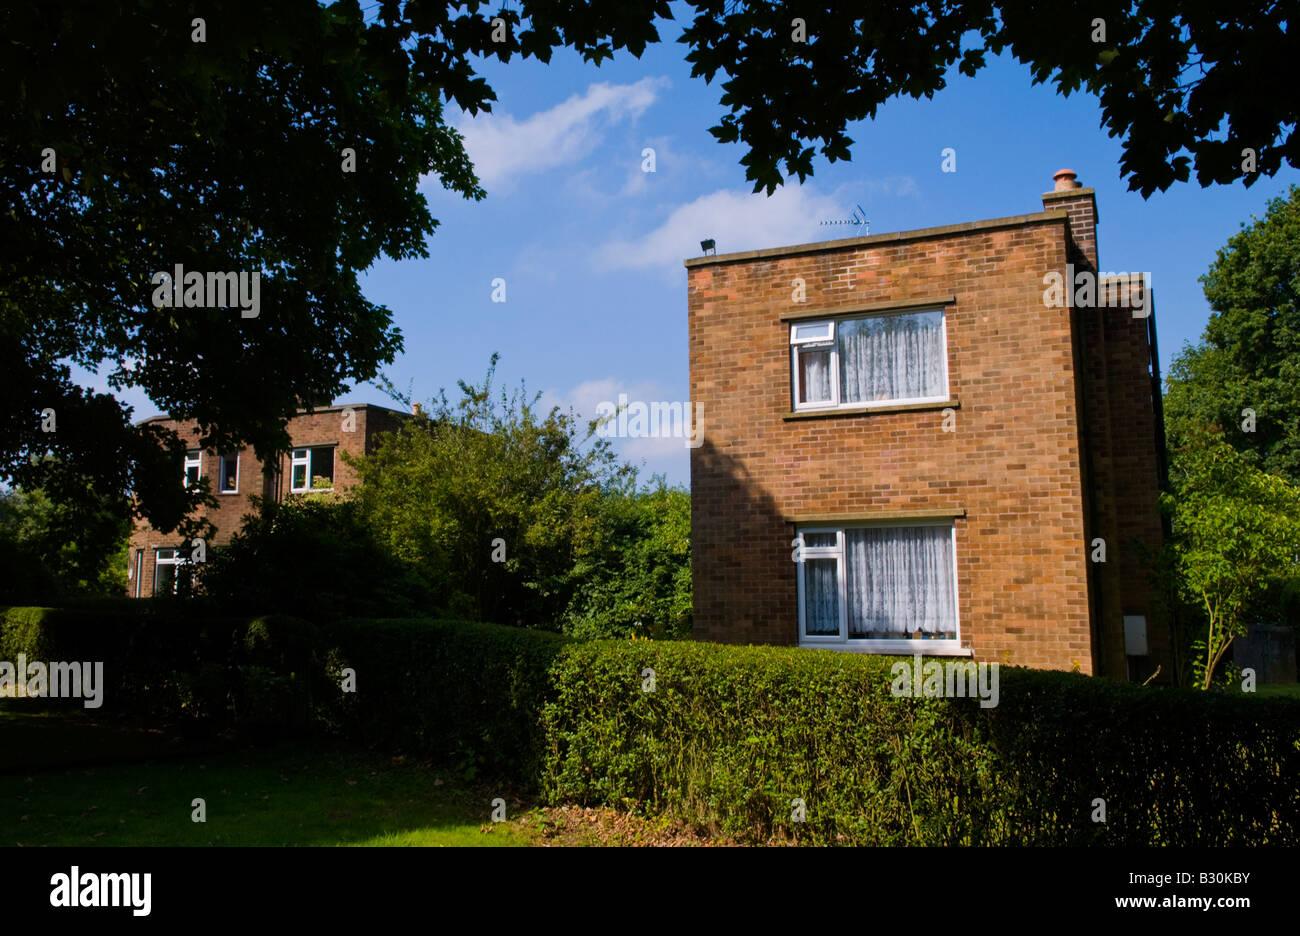 Detached house built in 1940s in rural Rufford Nottinghamshire England UK EU Stock Foto